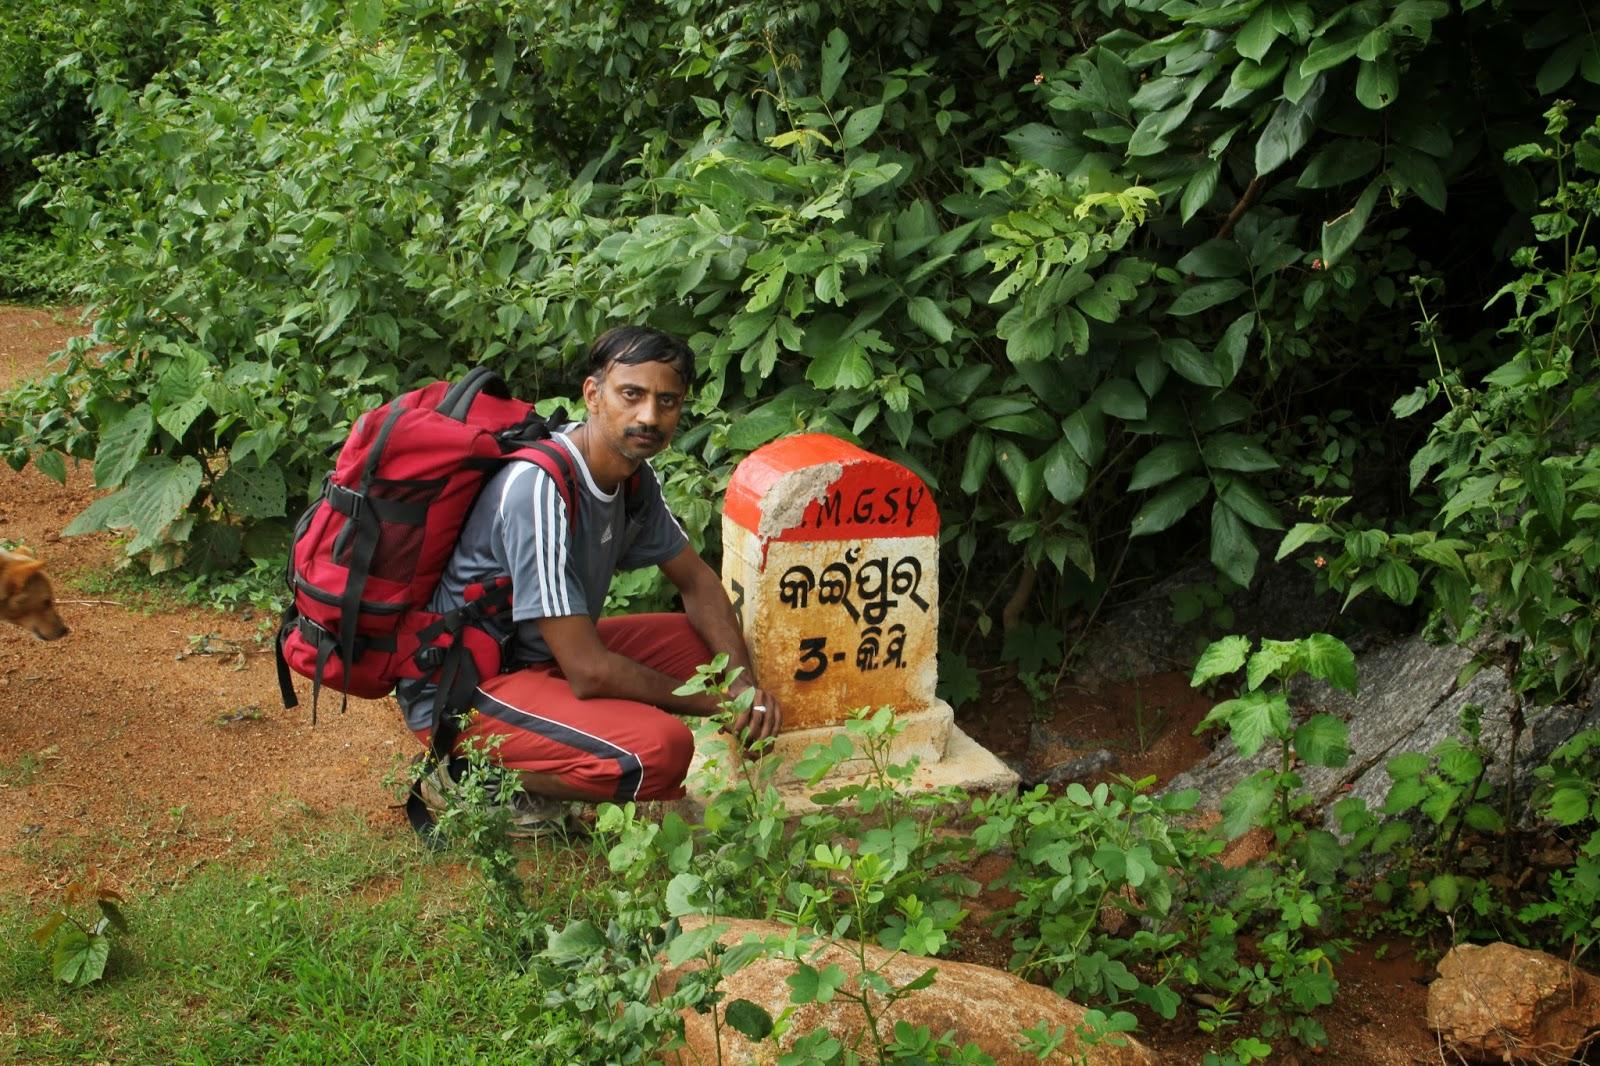 Sridhar - 3kms before Kainpur